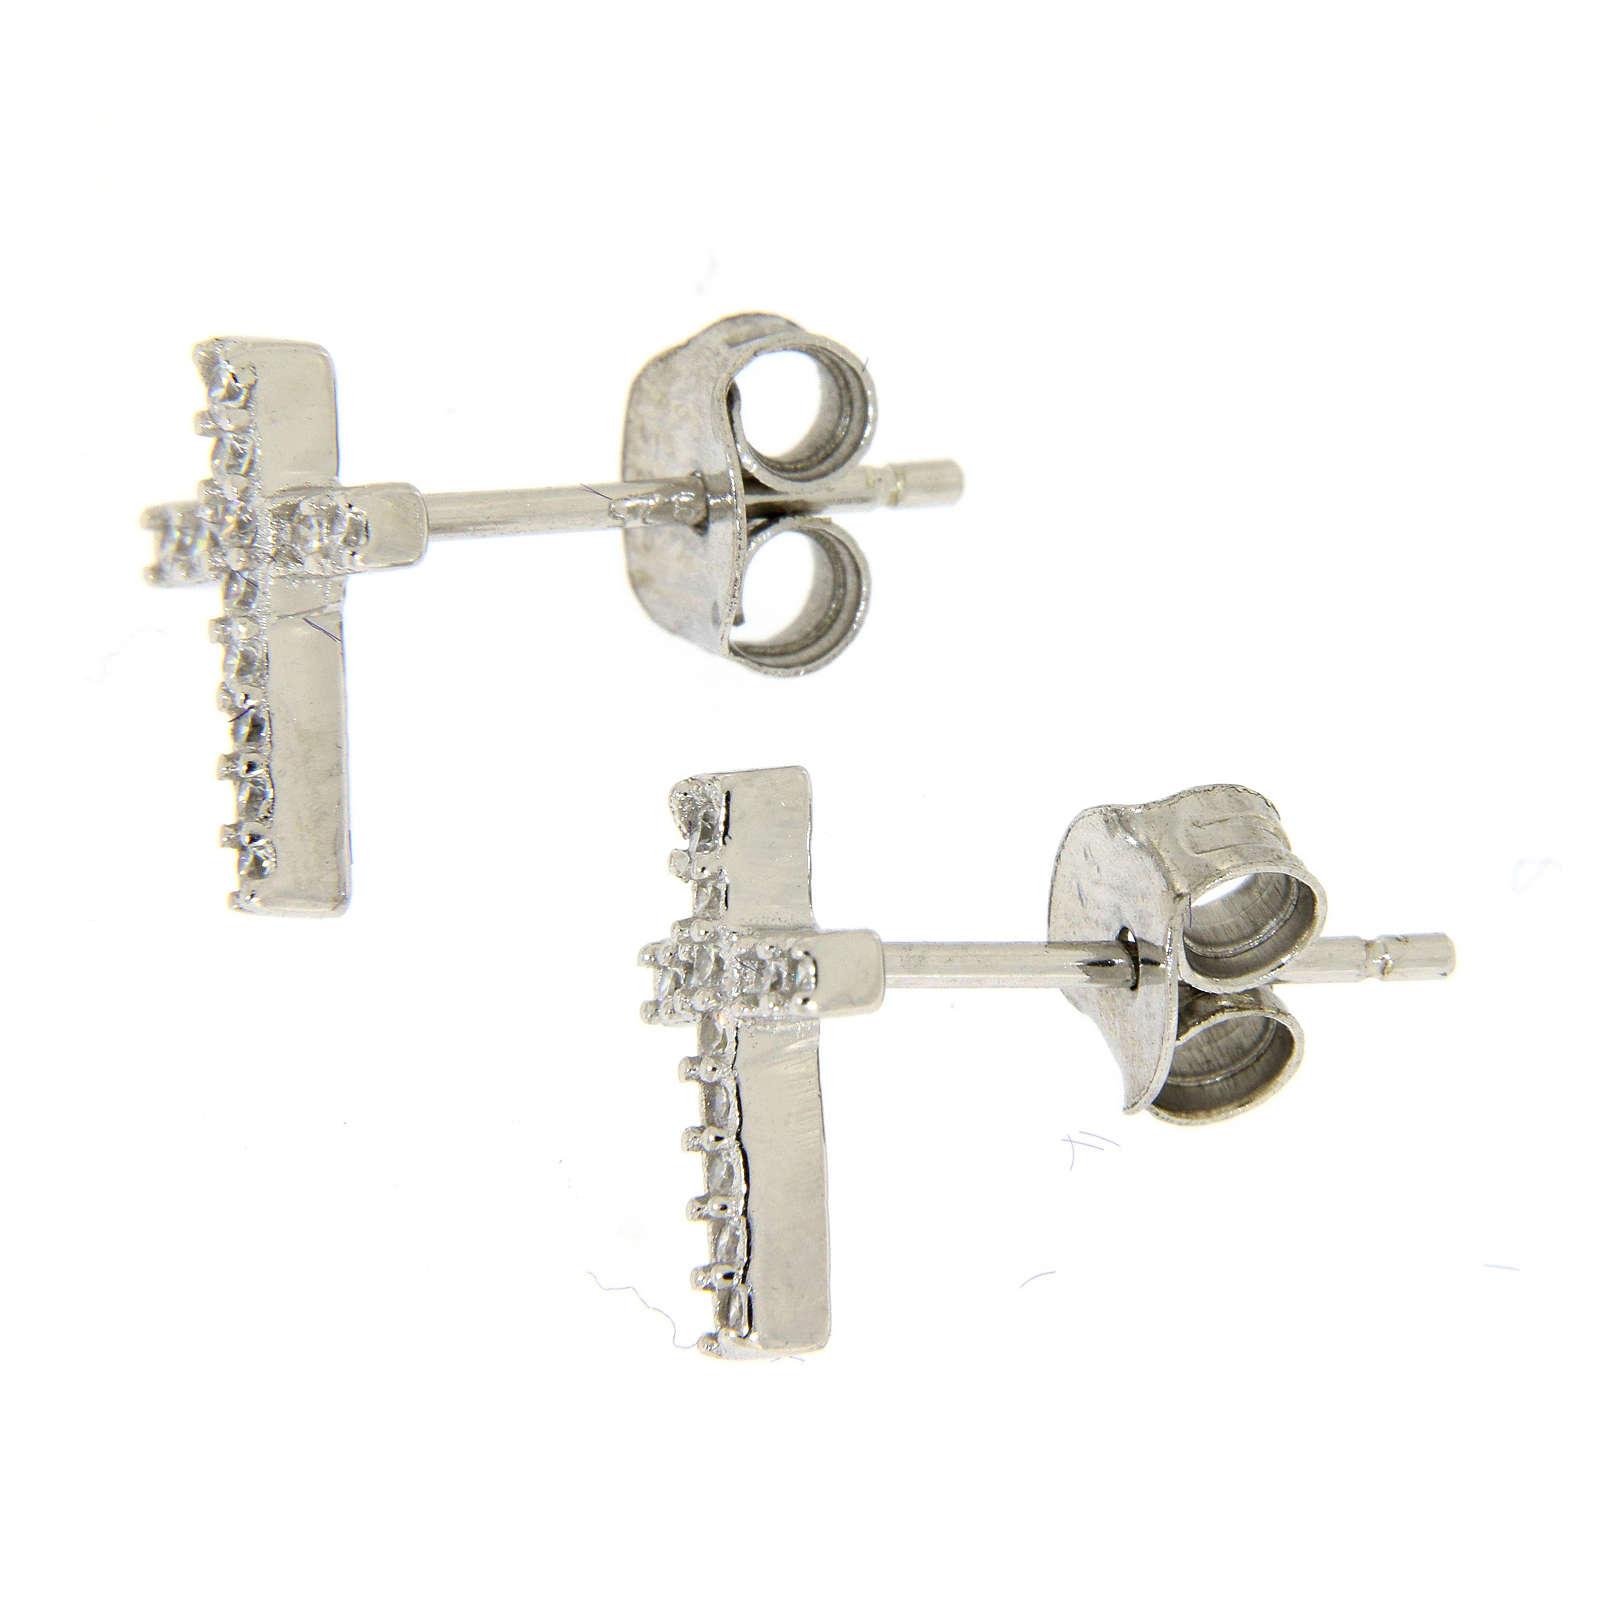 925 sterling silver parure: earrings, pendant chain and white zirconate cross 4